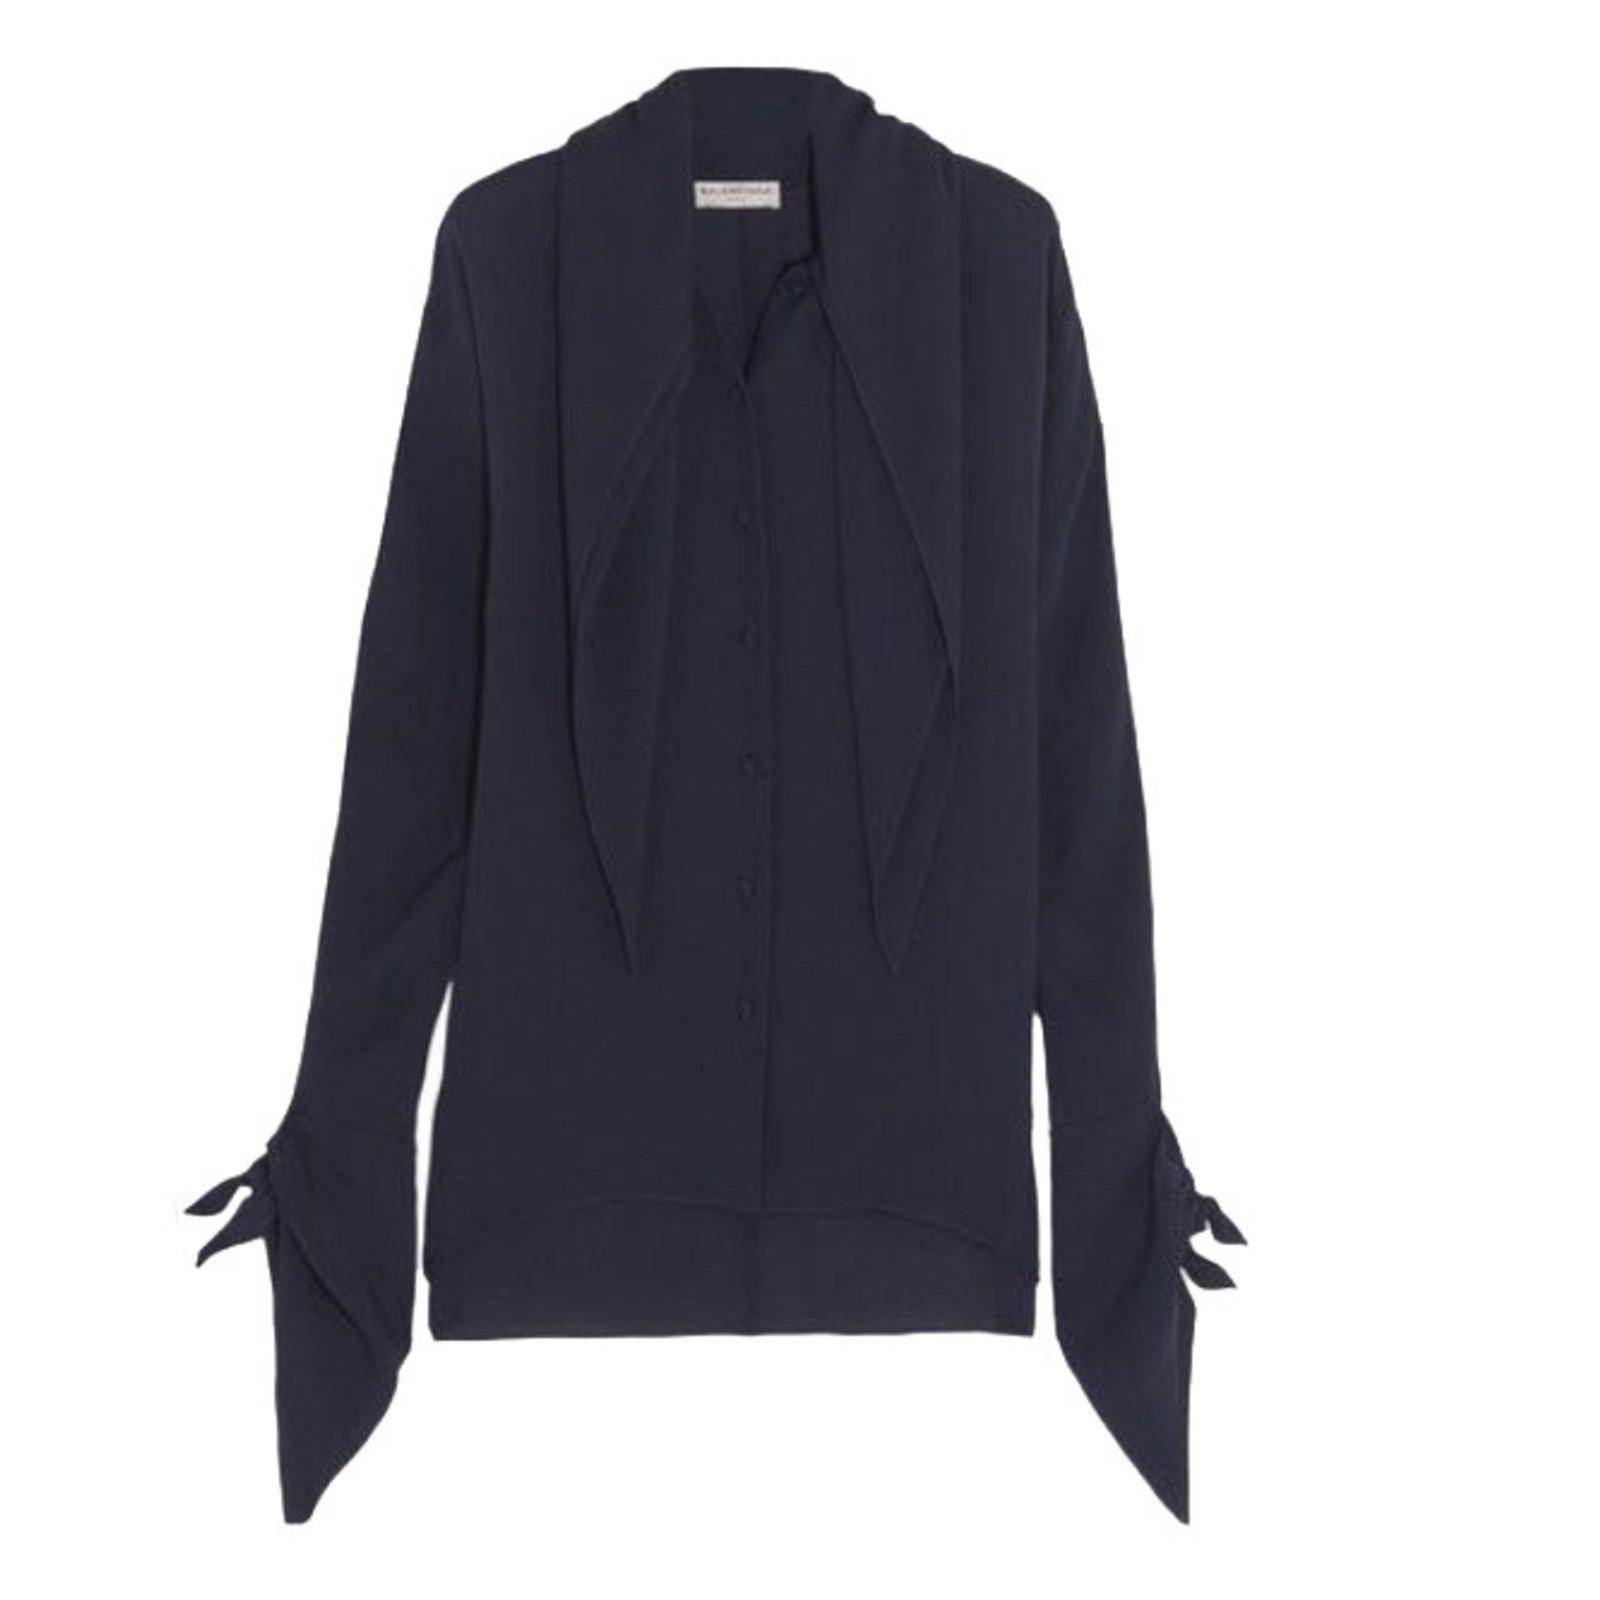 e4af855e4d82b Balenciaga Blouse Tops Silk Navy blue ref.39748 - Joli Closet